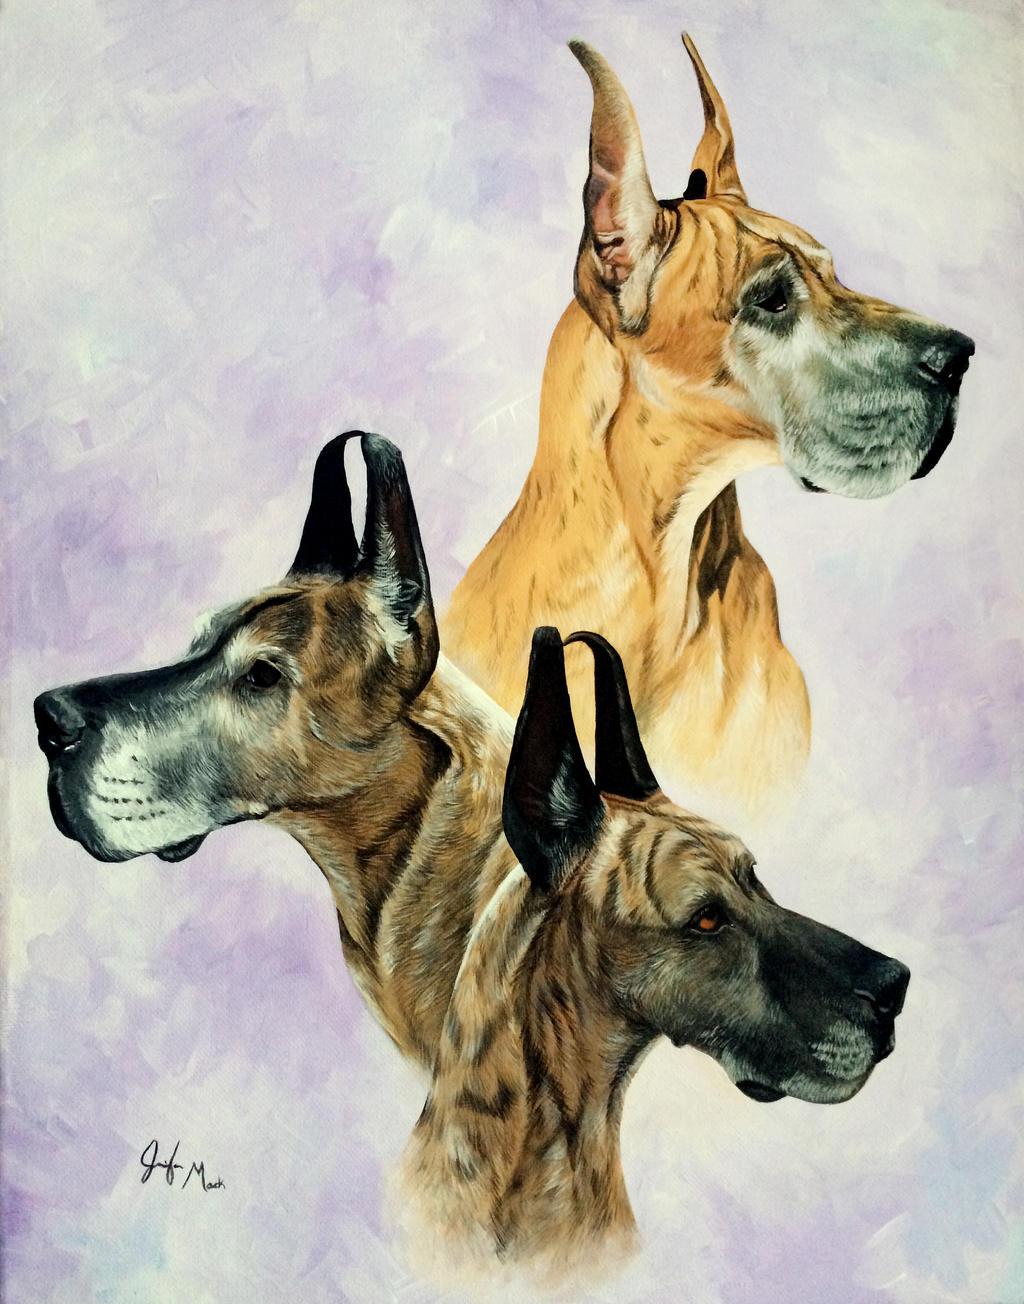 Cheyenne, Asia, and Georgia by LainDragon